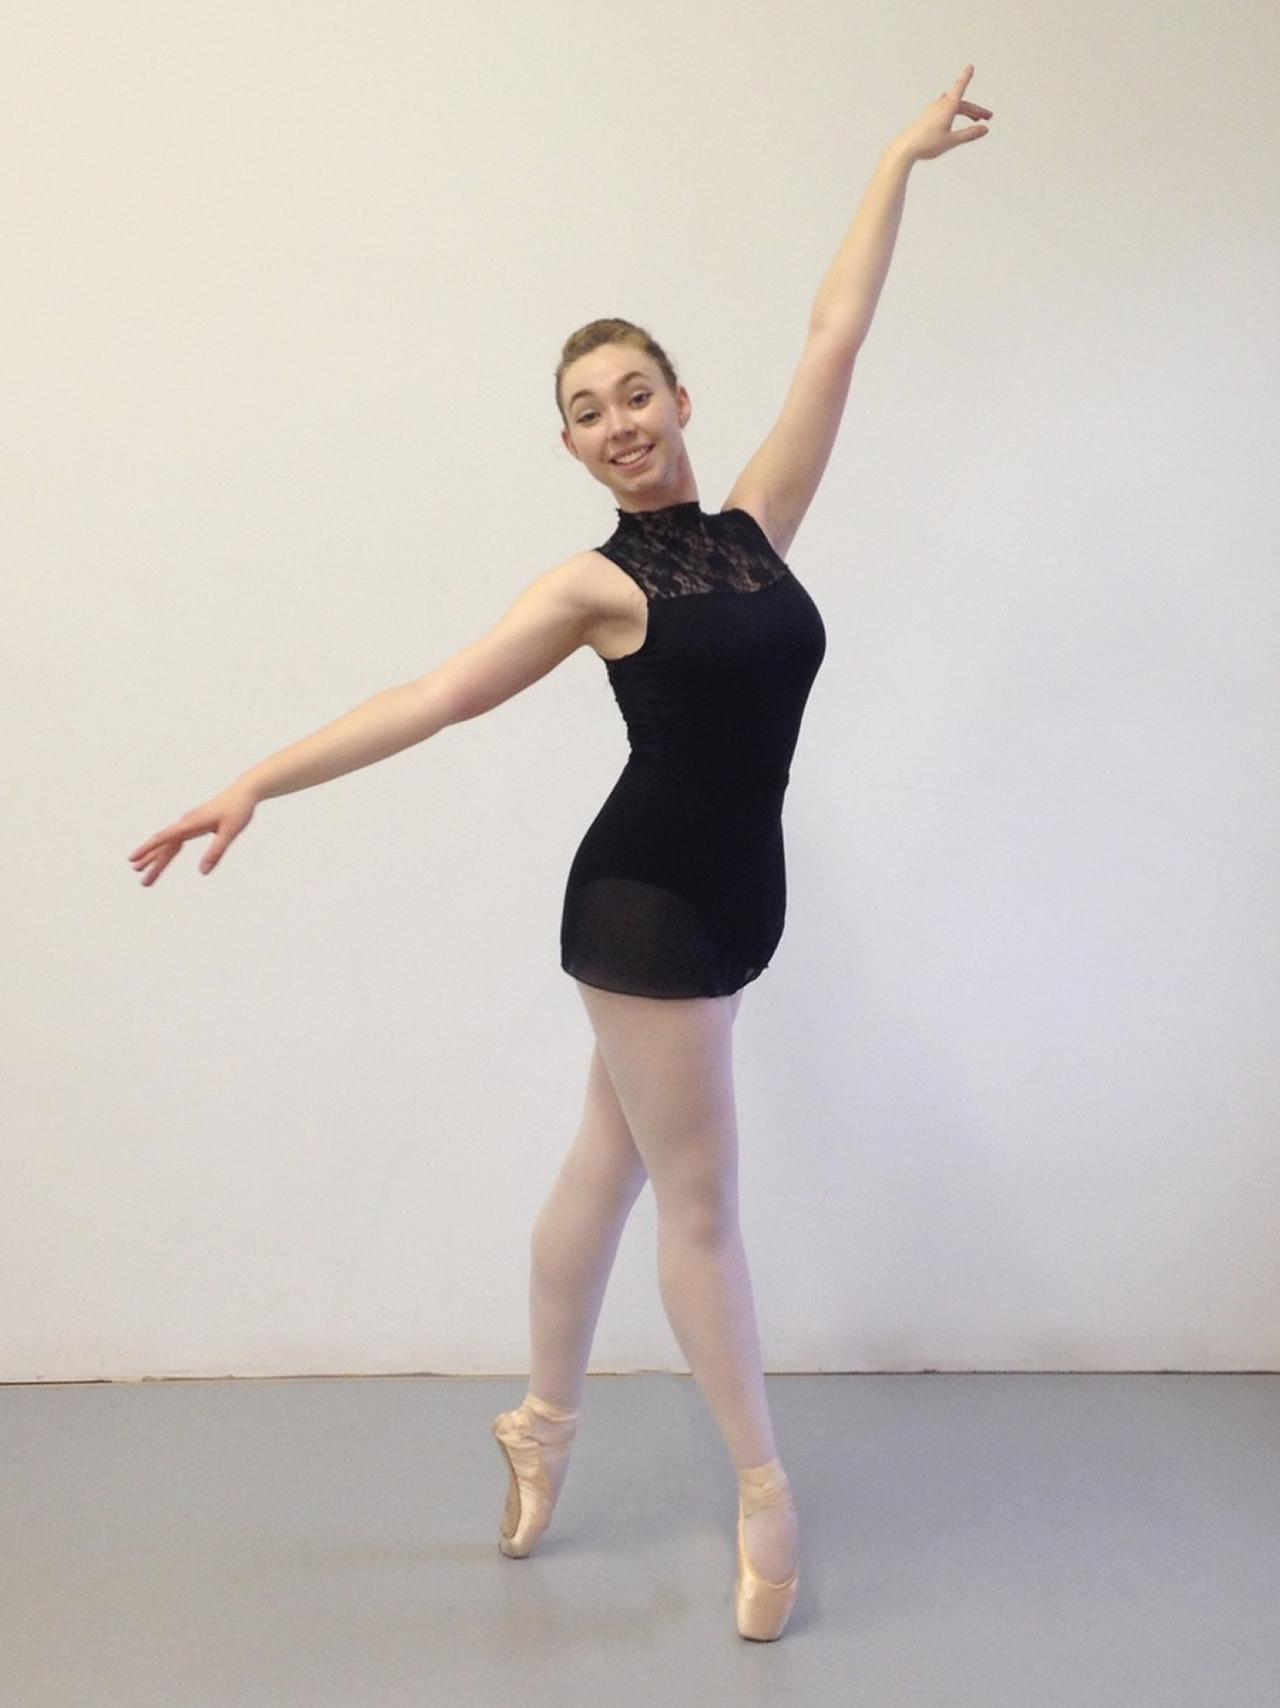 Samantha Kokinchak 2013